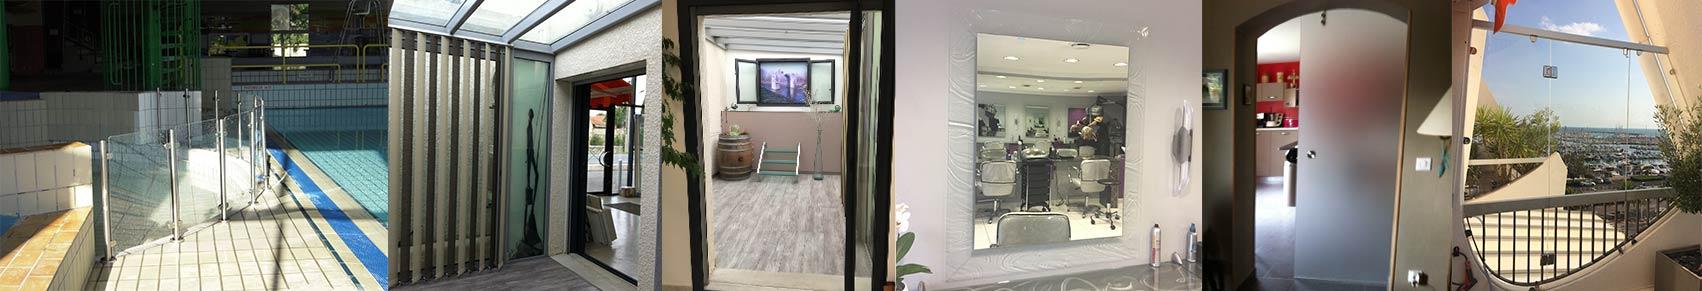 miroiterie elegant nf dtu travaux de with miroiterie top miroiterie de champagne with. Black Bedroom Furniture Sets. Home Design Ideas